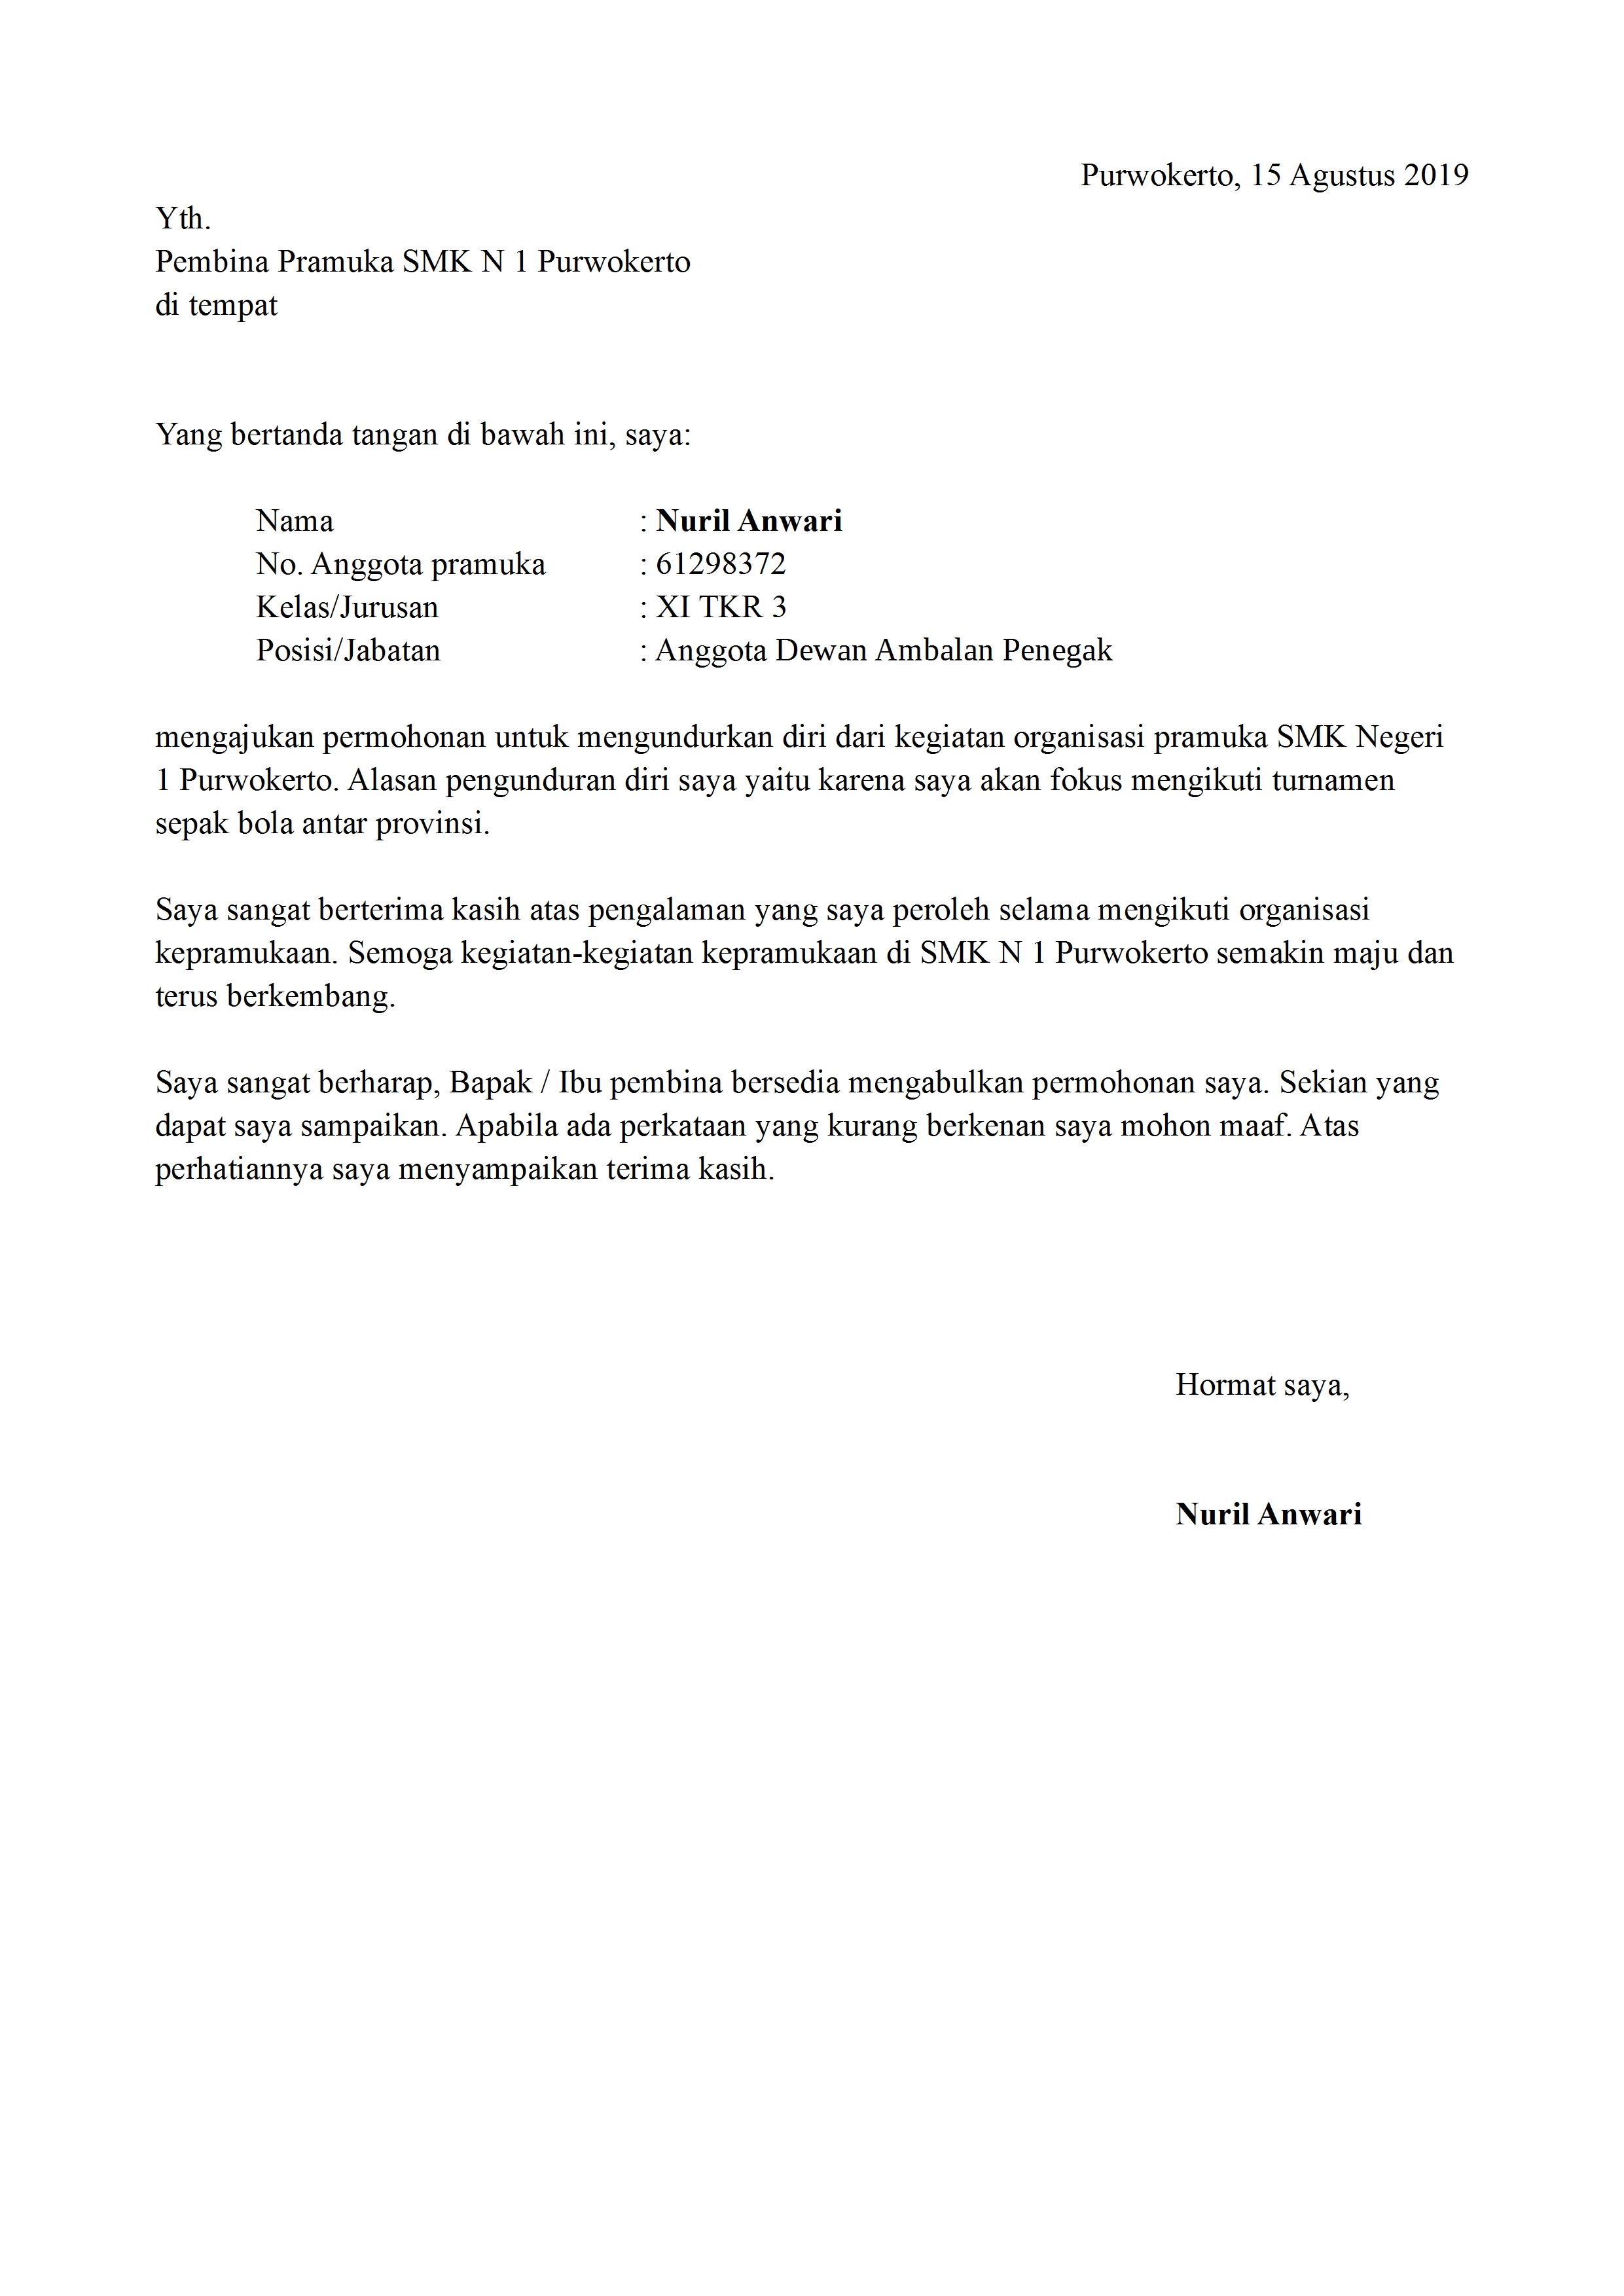 Surat Pengunduran Diri Organisasi Sekolah Yang Baik Dan